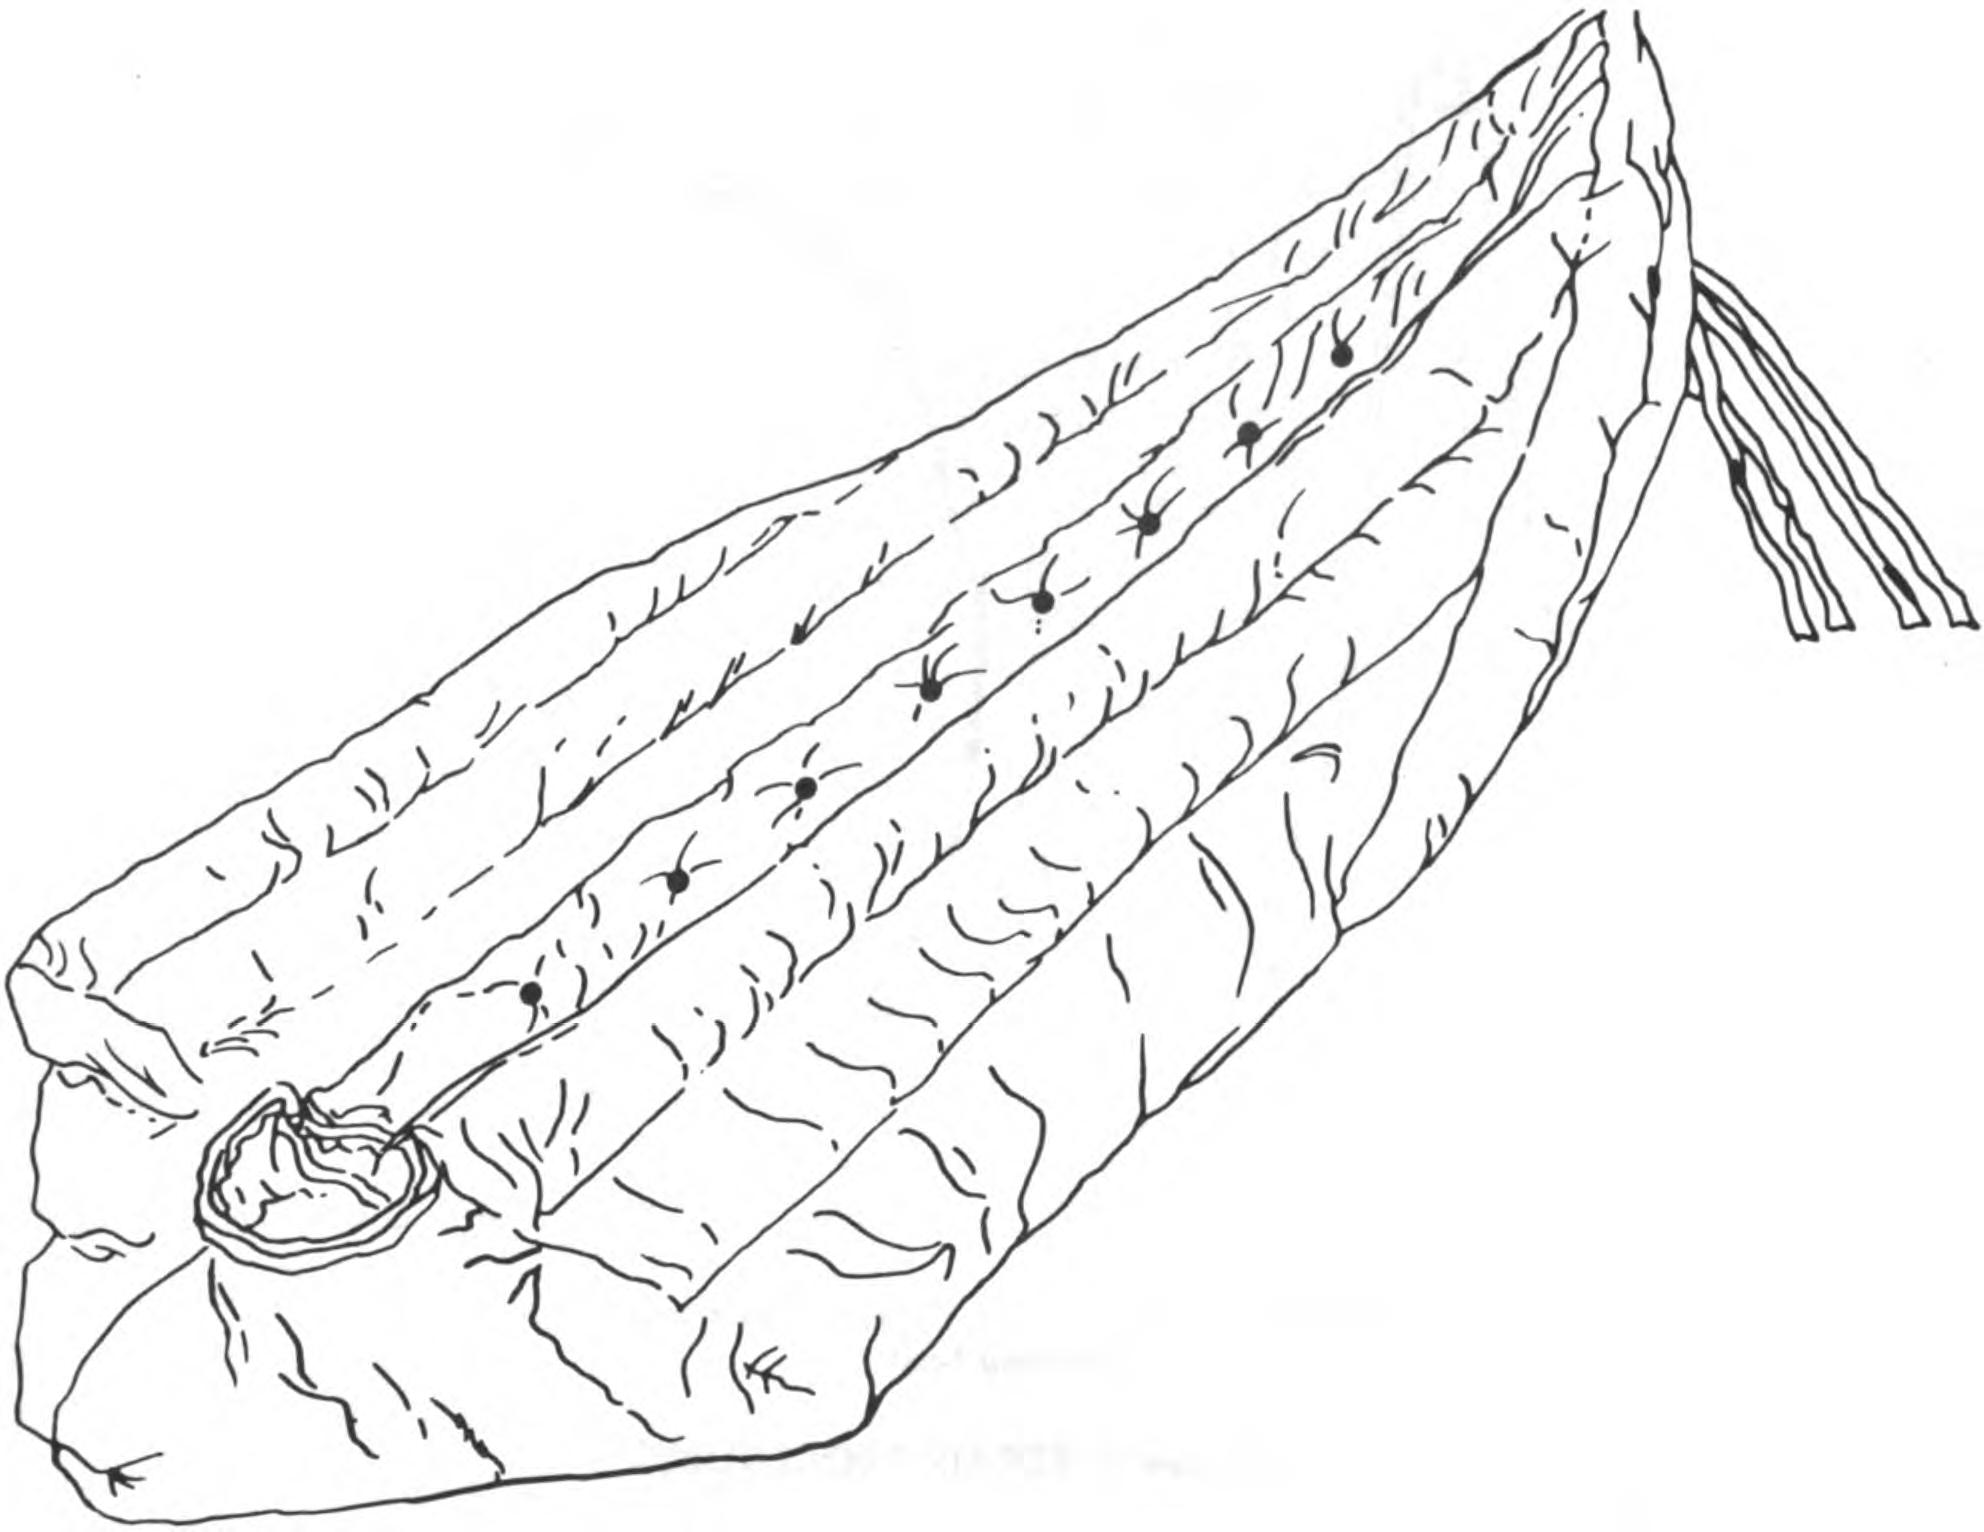 1984x1532 Extreme Cold Weather Sleeping Bag